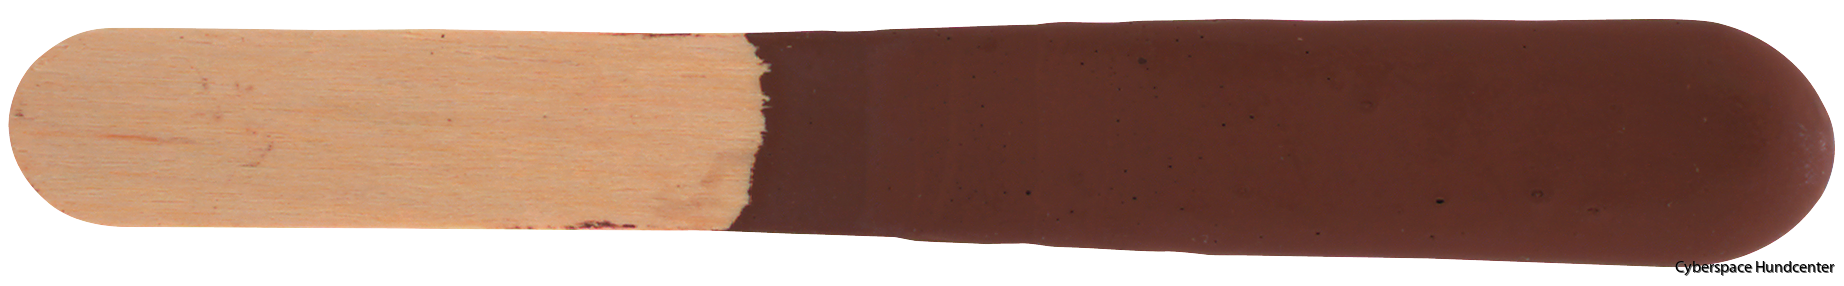 028-RedBrown-ChrisStix_FullRes